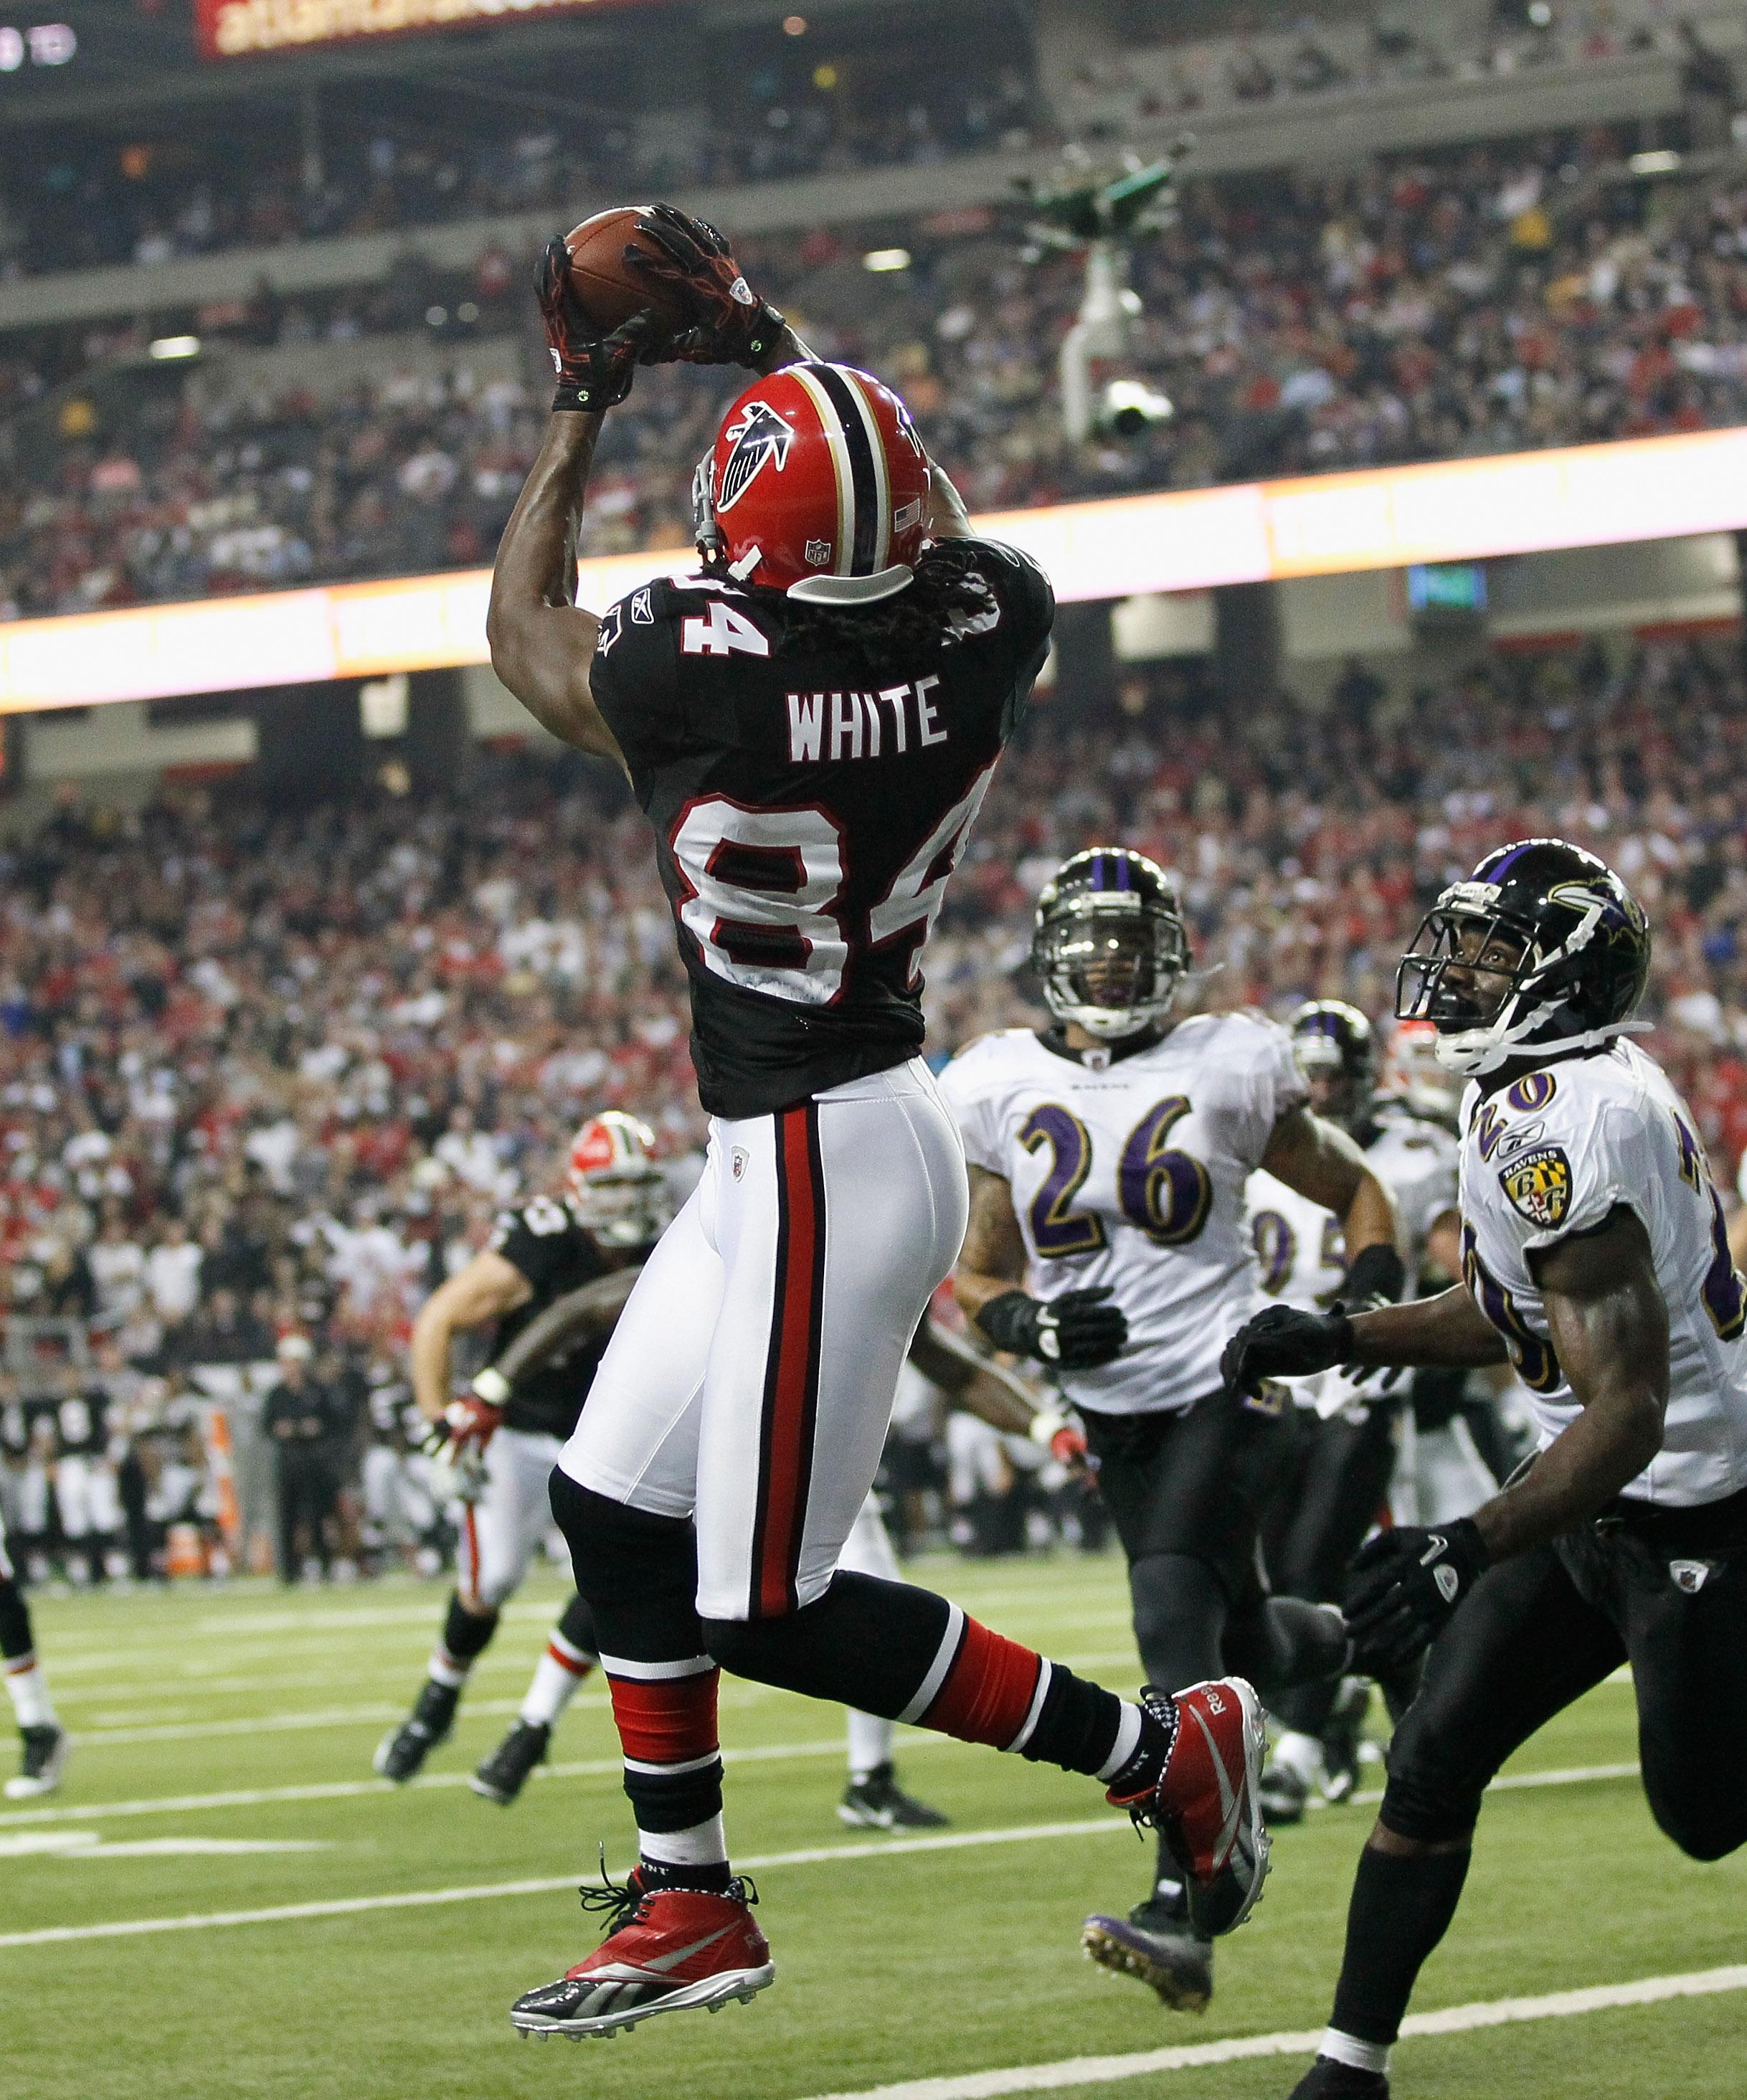 ATLANTA - NOVEMBER 11:  Roddy White #84 of the Atlanta Falcons against the Baltimore Ravens at Georgia Dome on November 11, 2010 in Atlanta, Georgia.  (Photo by Kevin C. Cox/Getty Images)